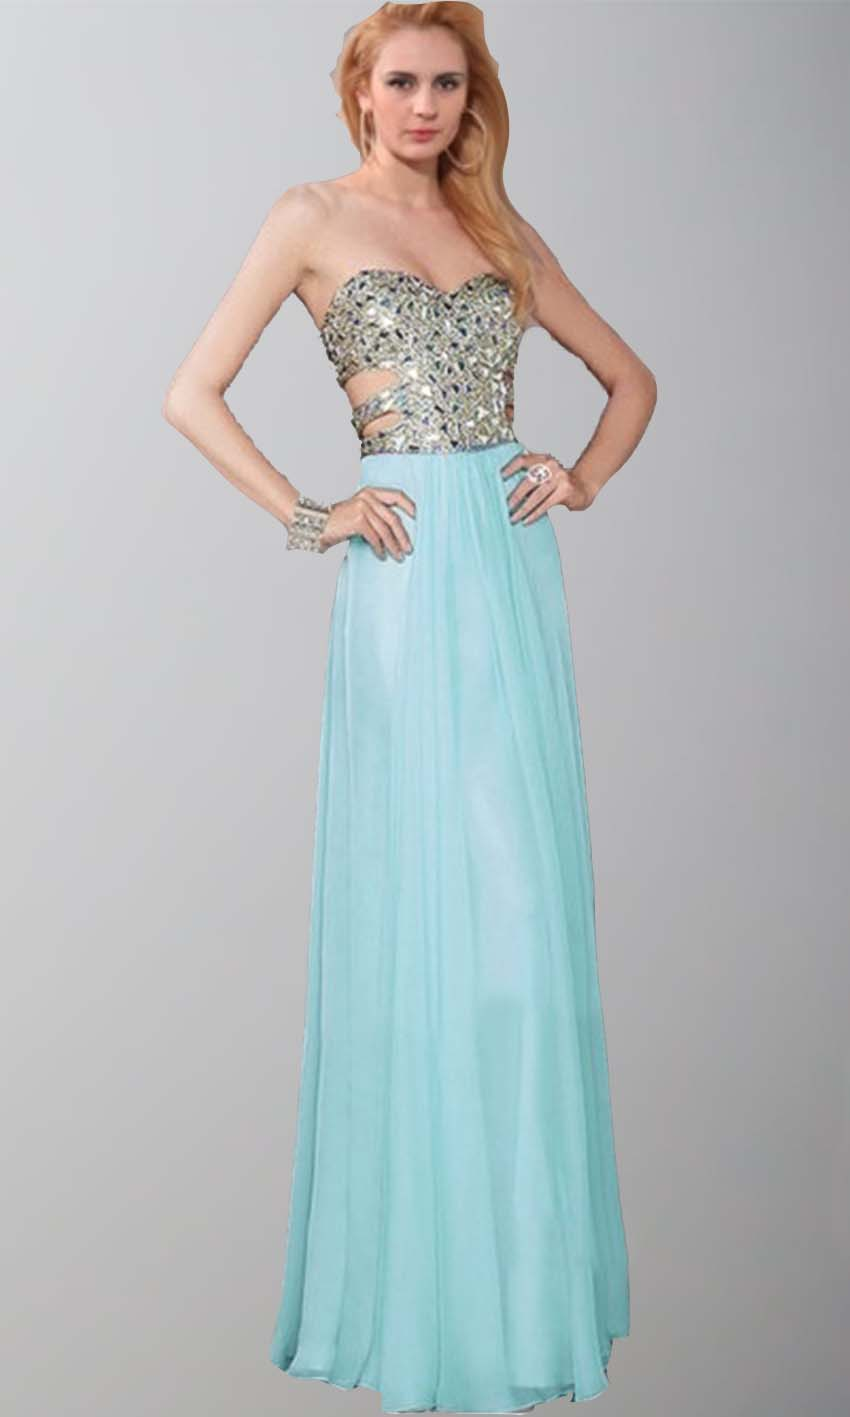 Modern Prom Dresses Torquay Component - All Wedding Dresses ...